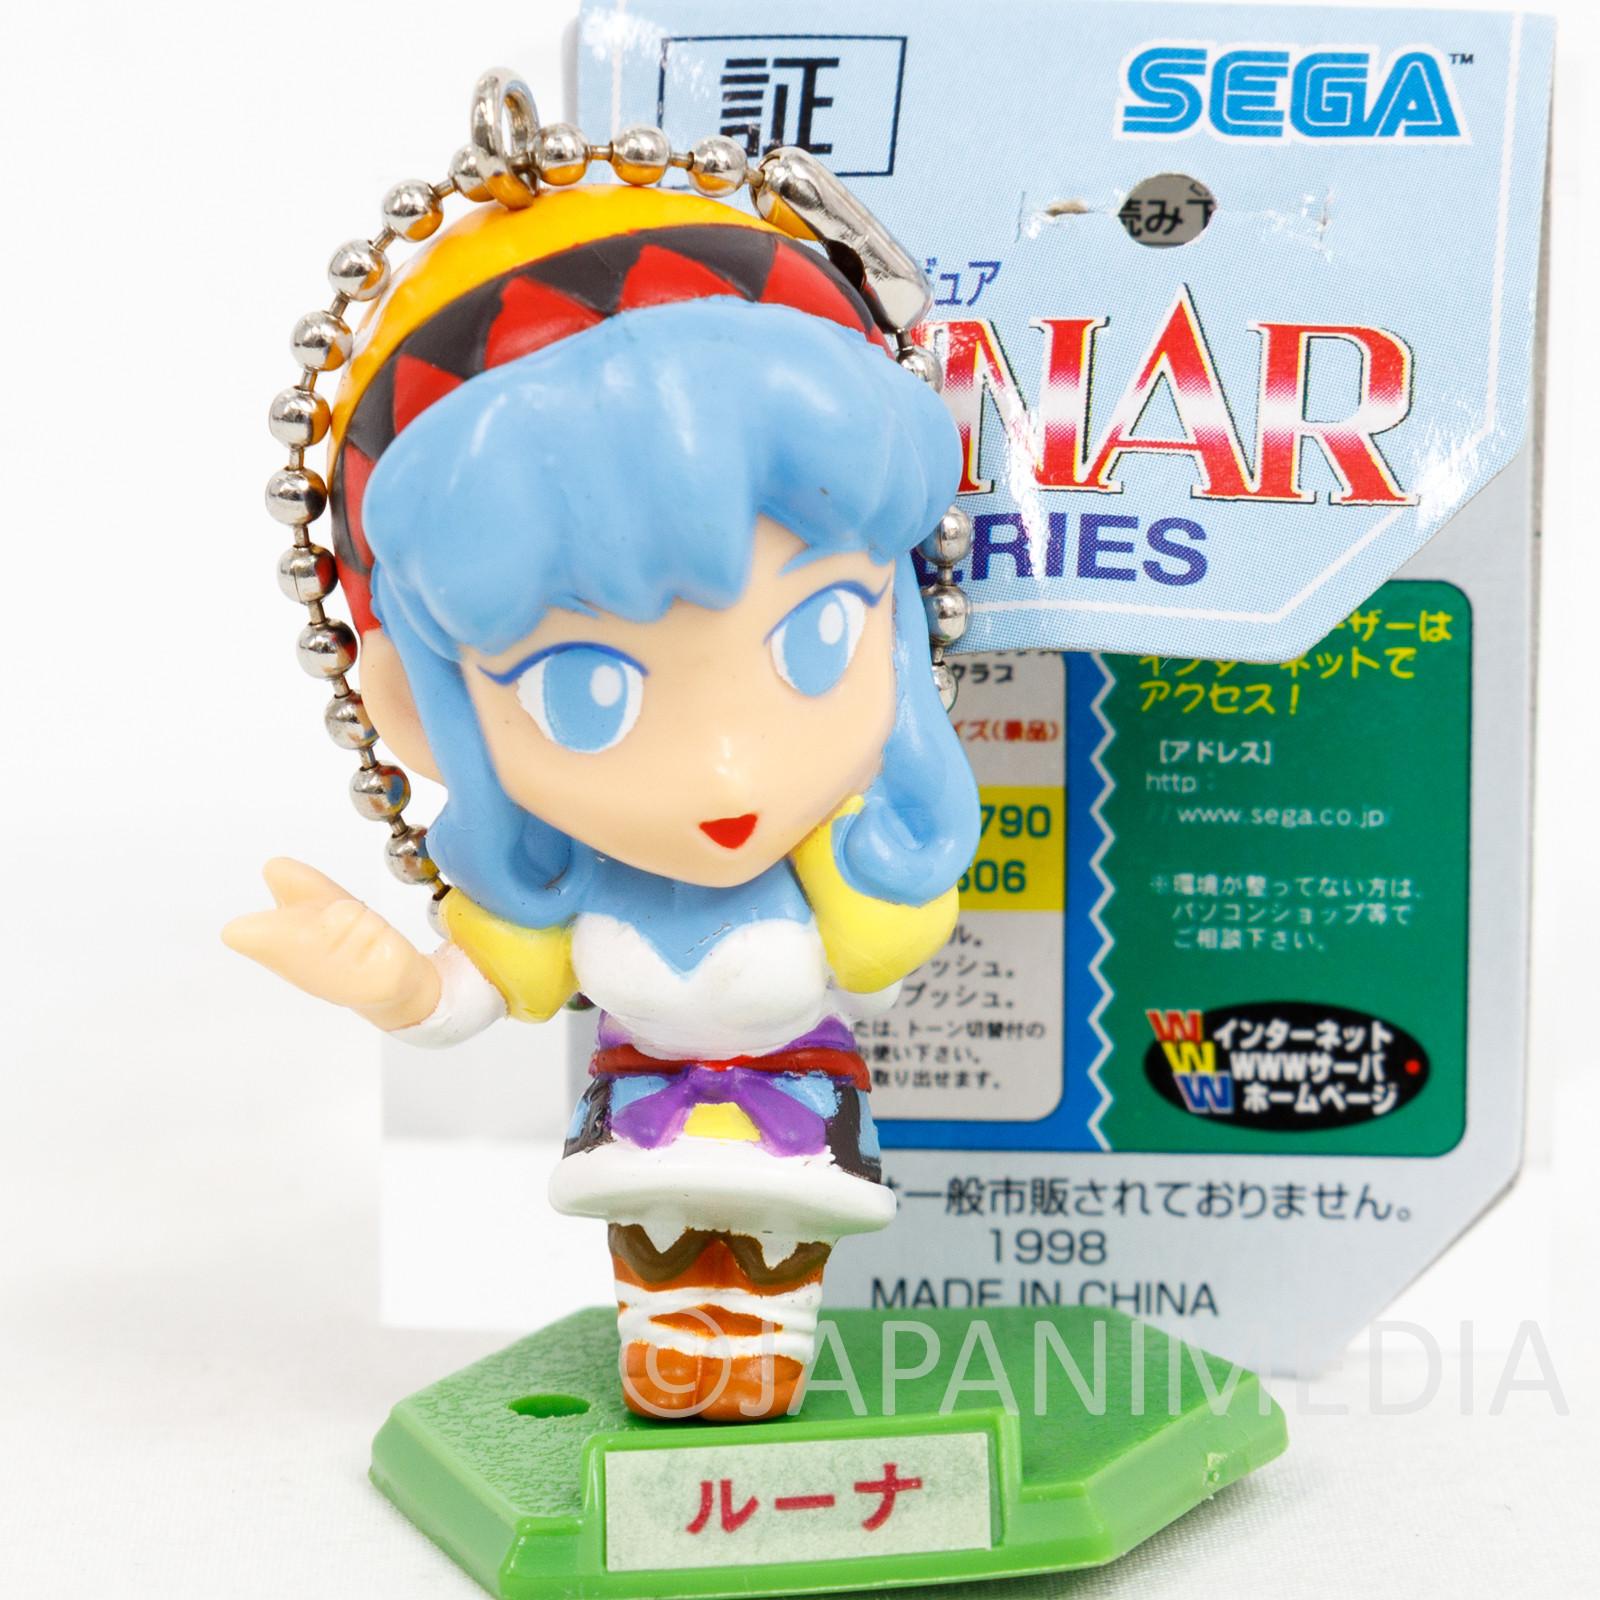 RARE!! LUNAR Series Character Figure Ballchain Luna Noa JAPAN SEGA GAME